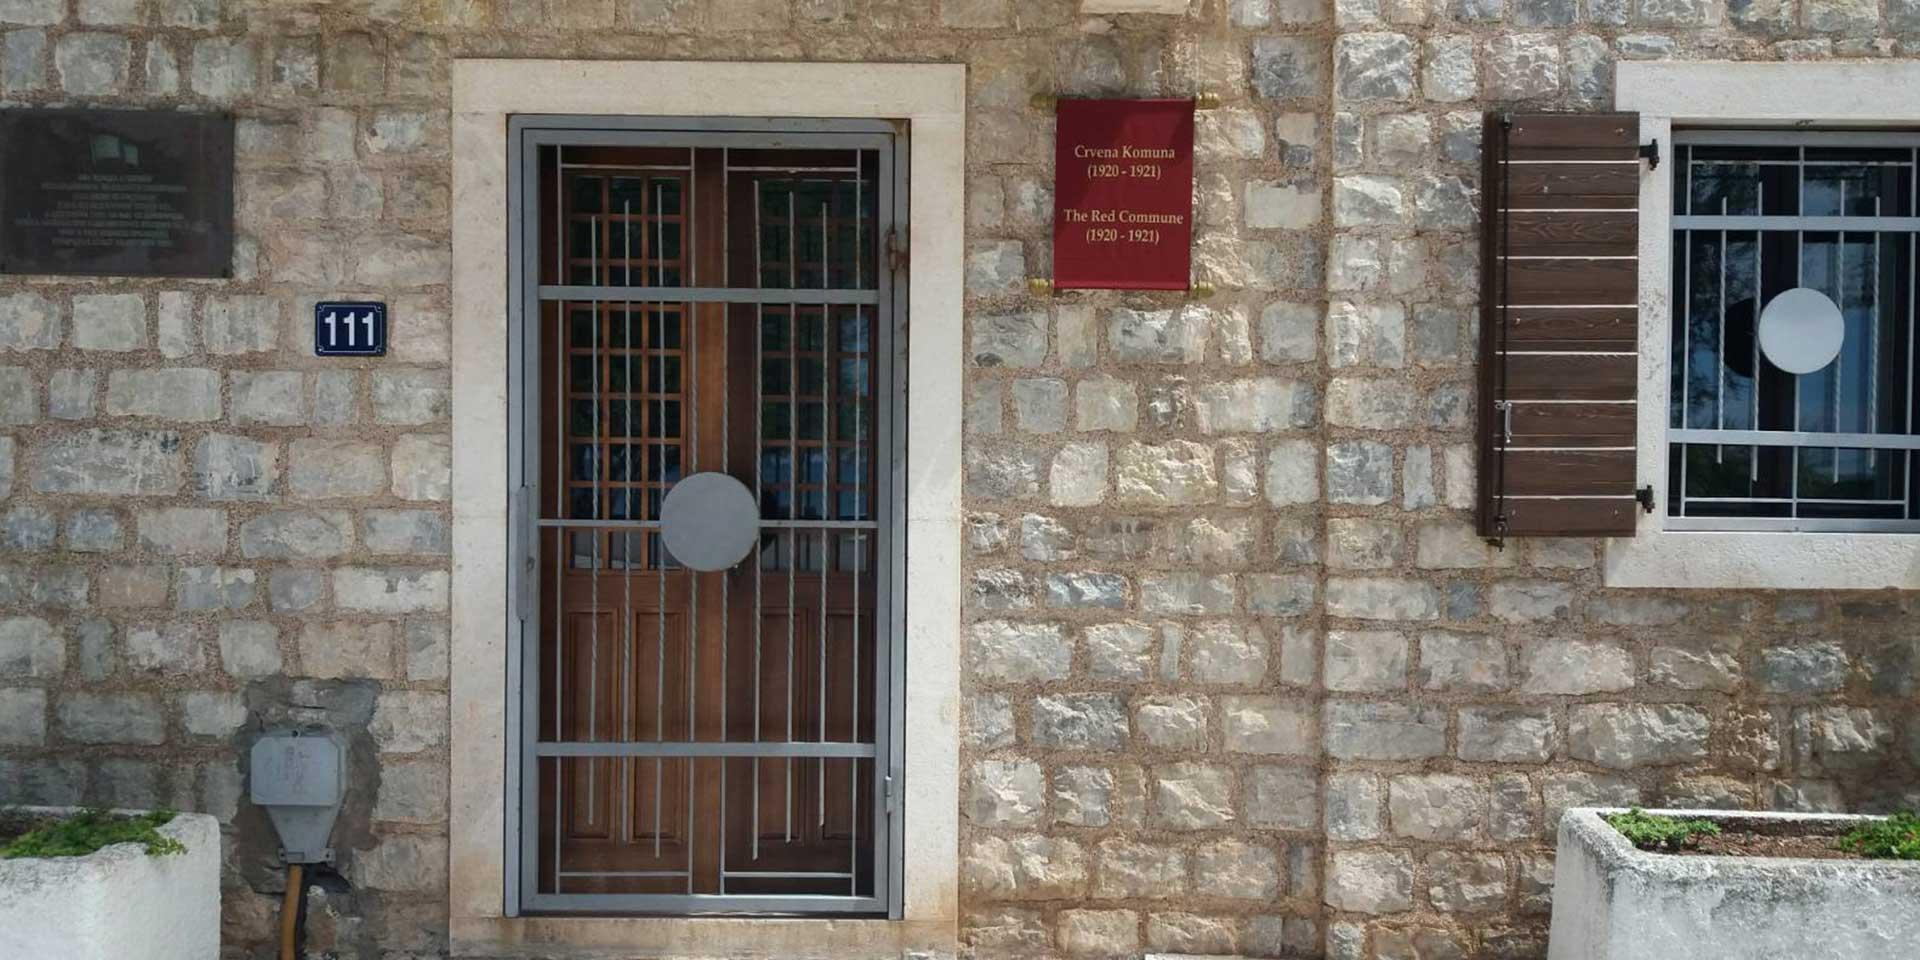 budva-Montenegro budva-food budva-hostels budva-weather budva-apartments